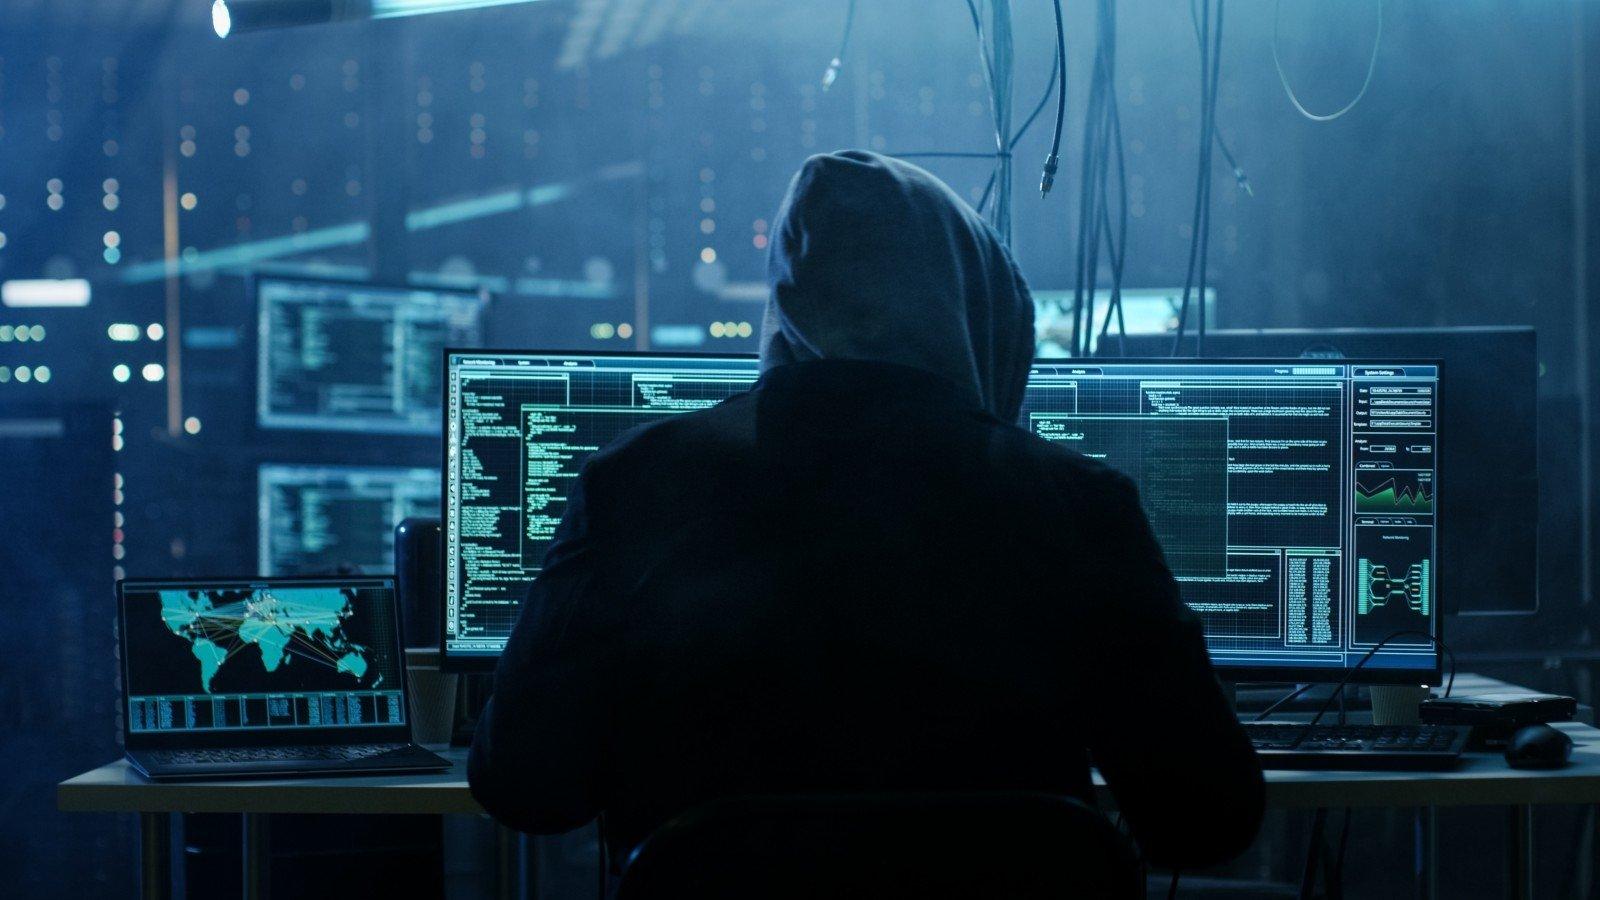 Spy Computer Via Windows Spy Software